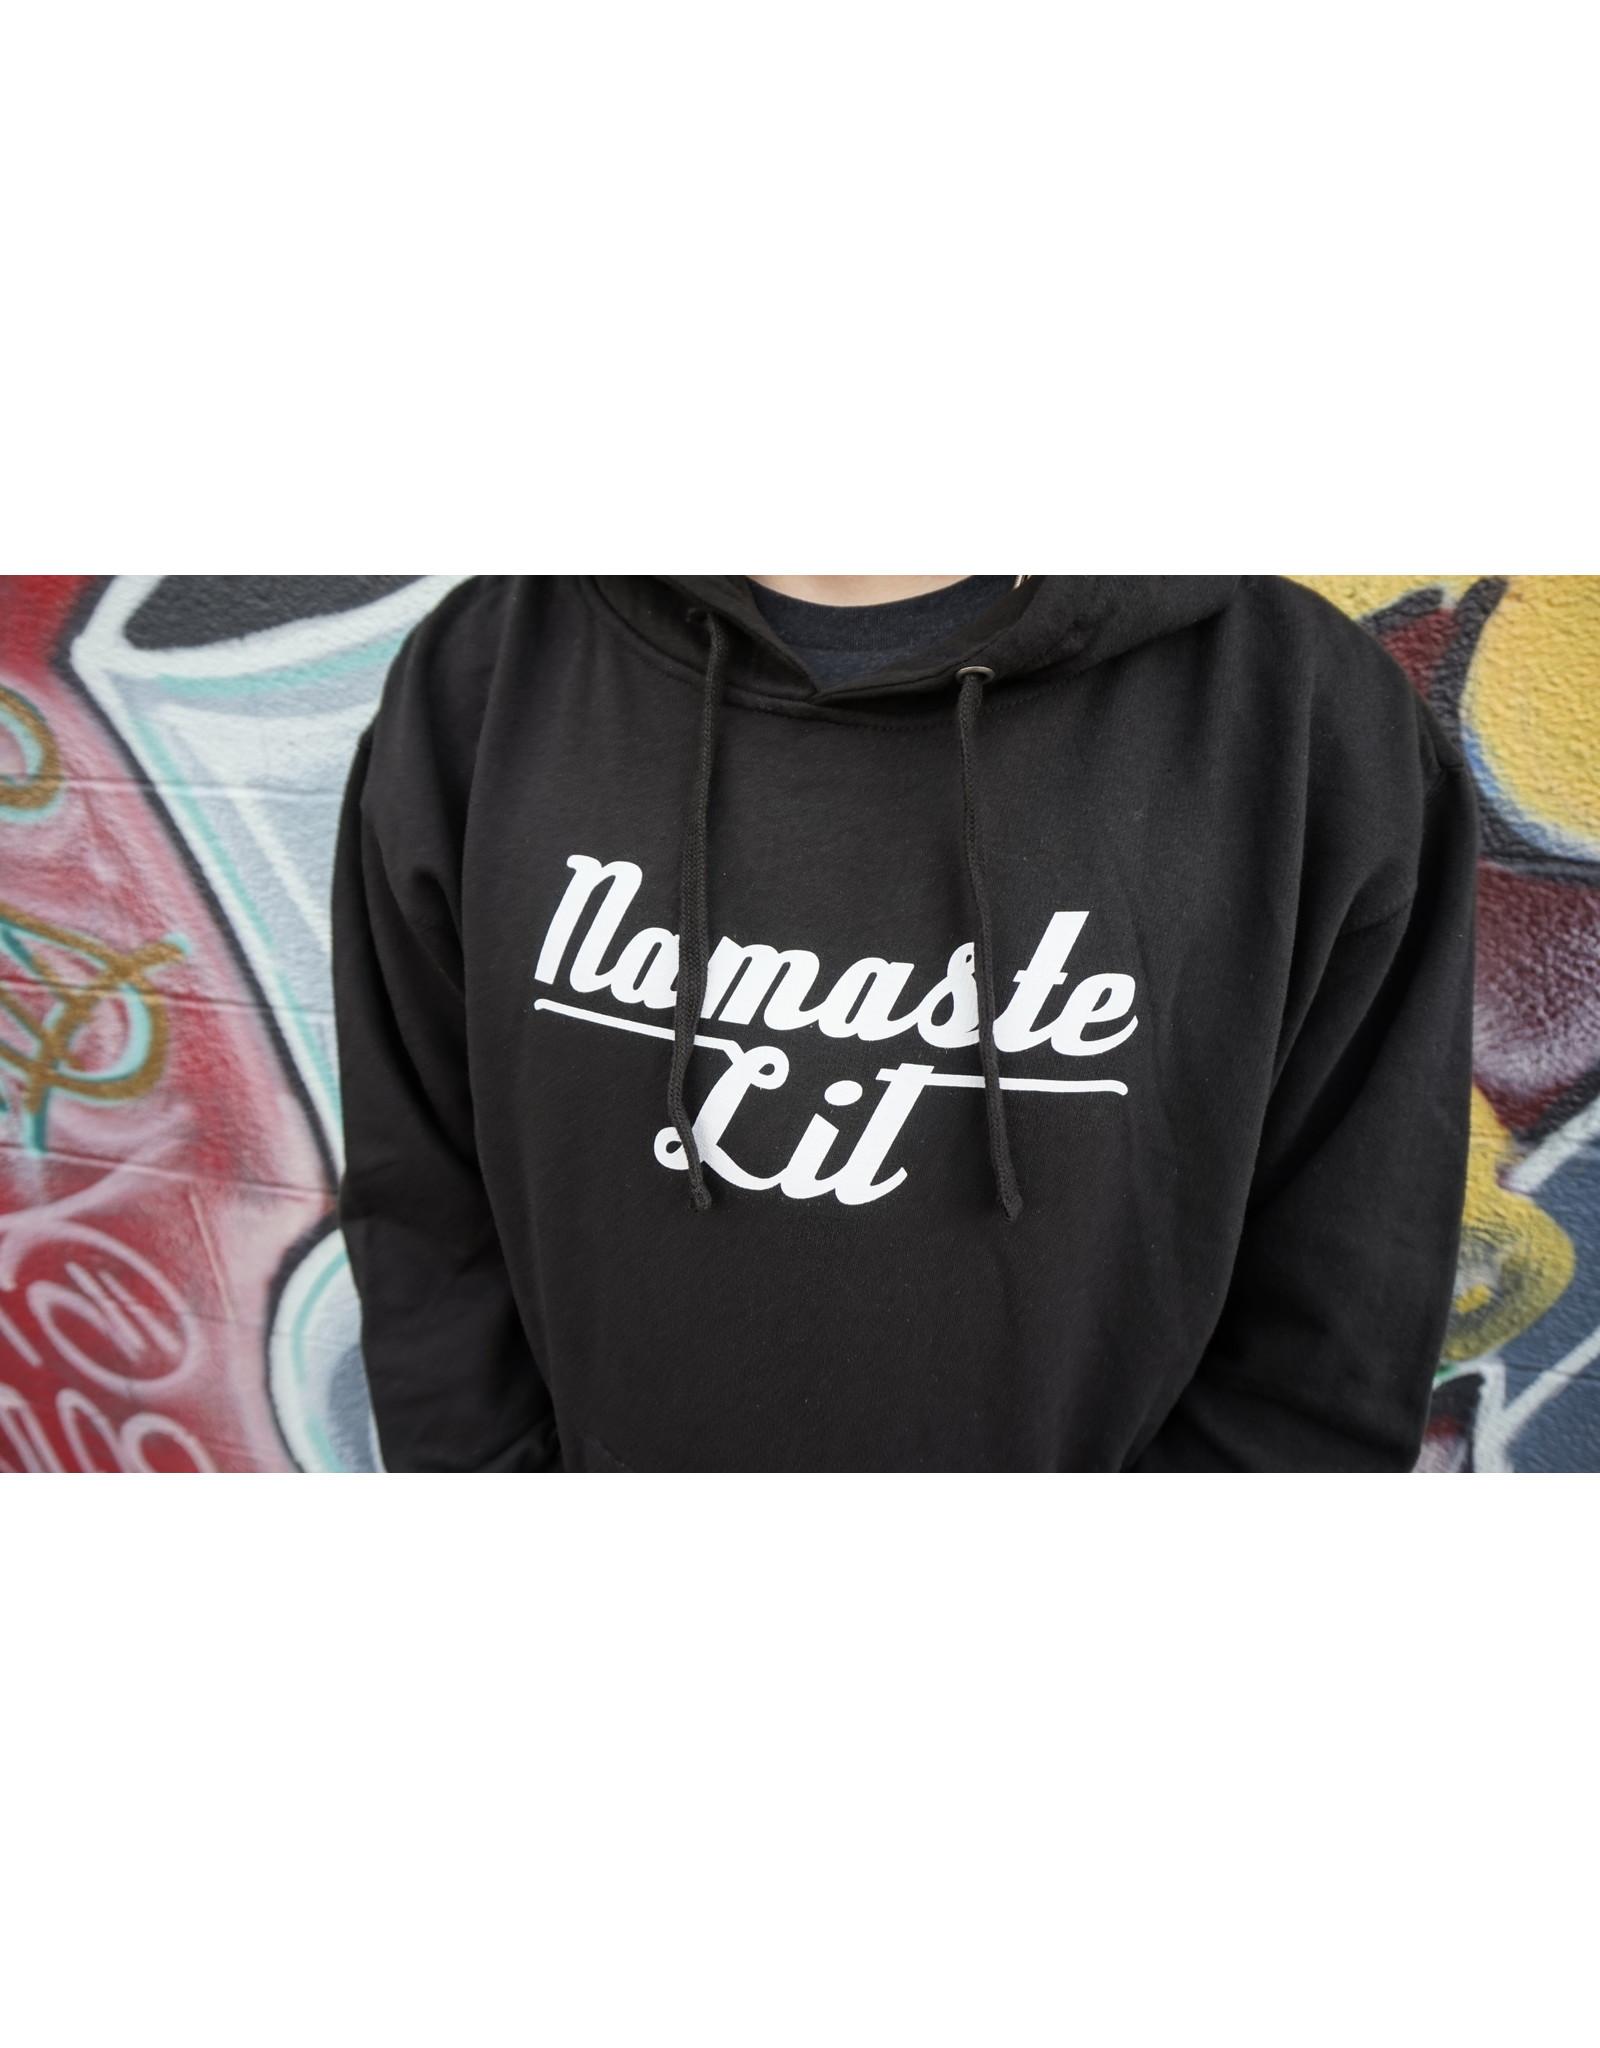 Be Lit Be Lit Black Hoodie - Namaste Lit V2